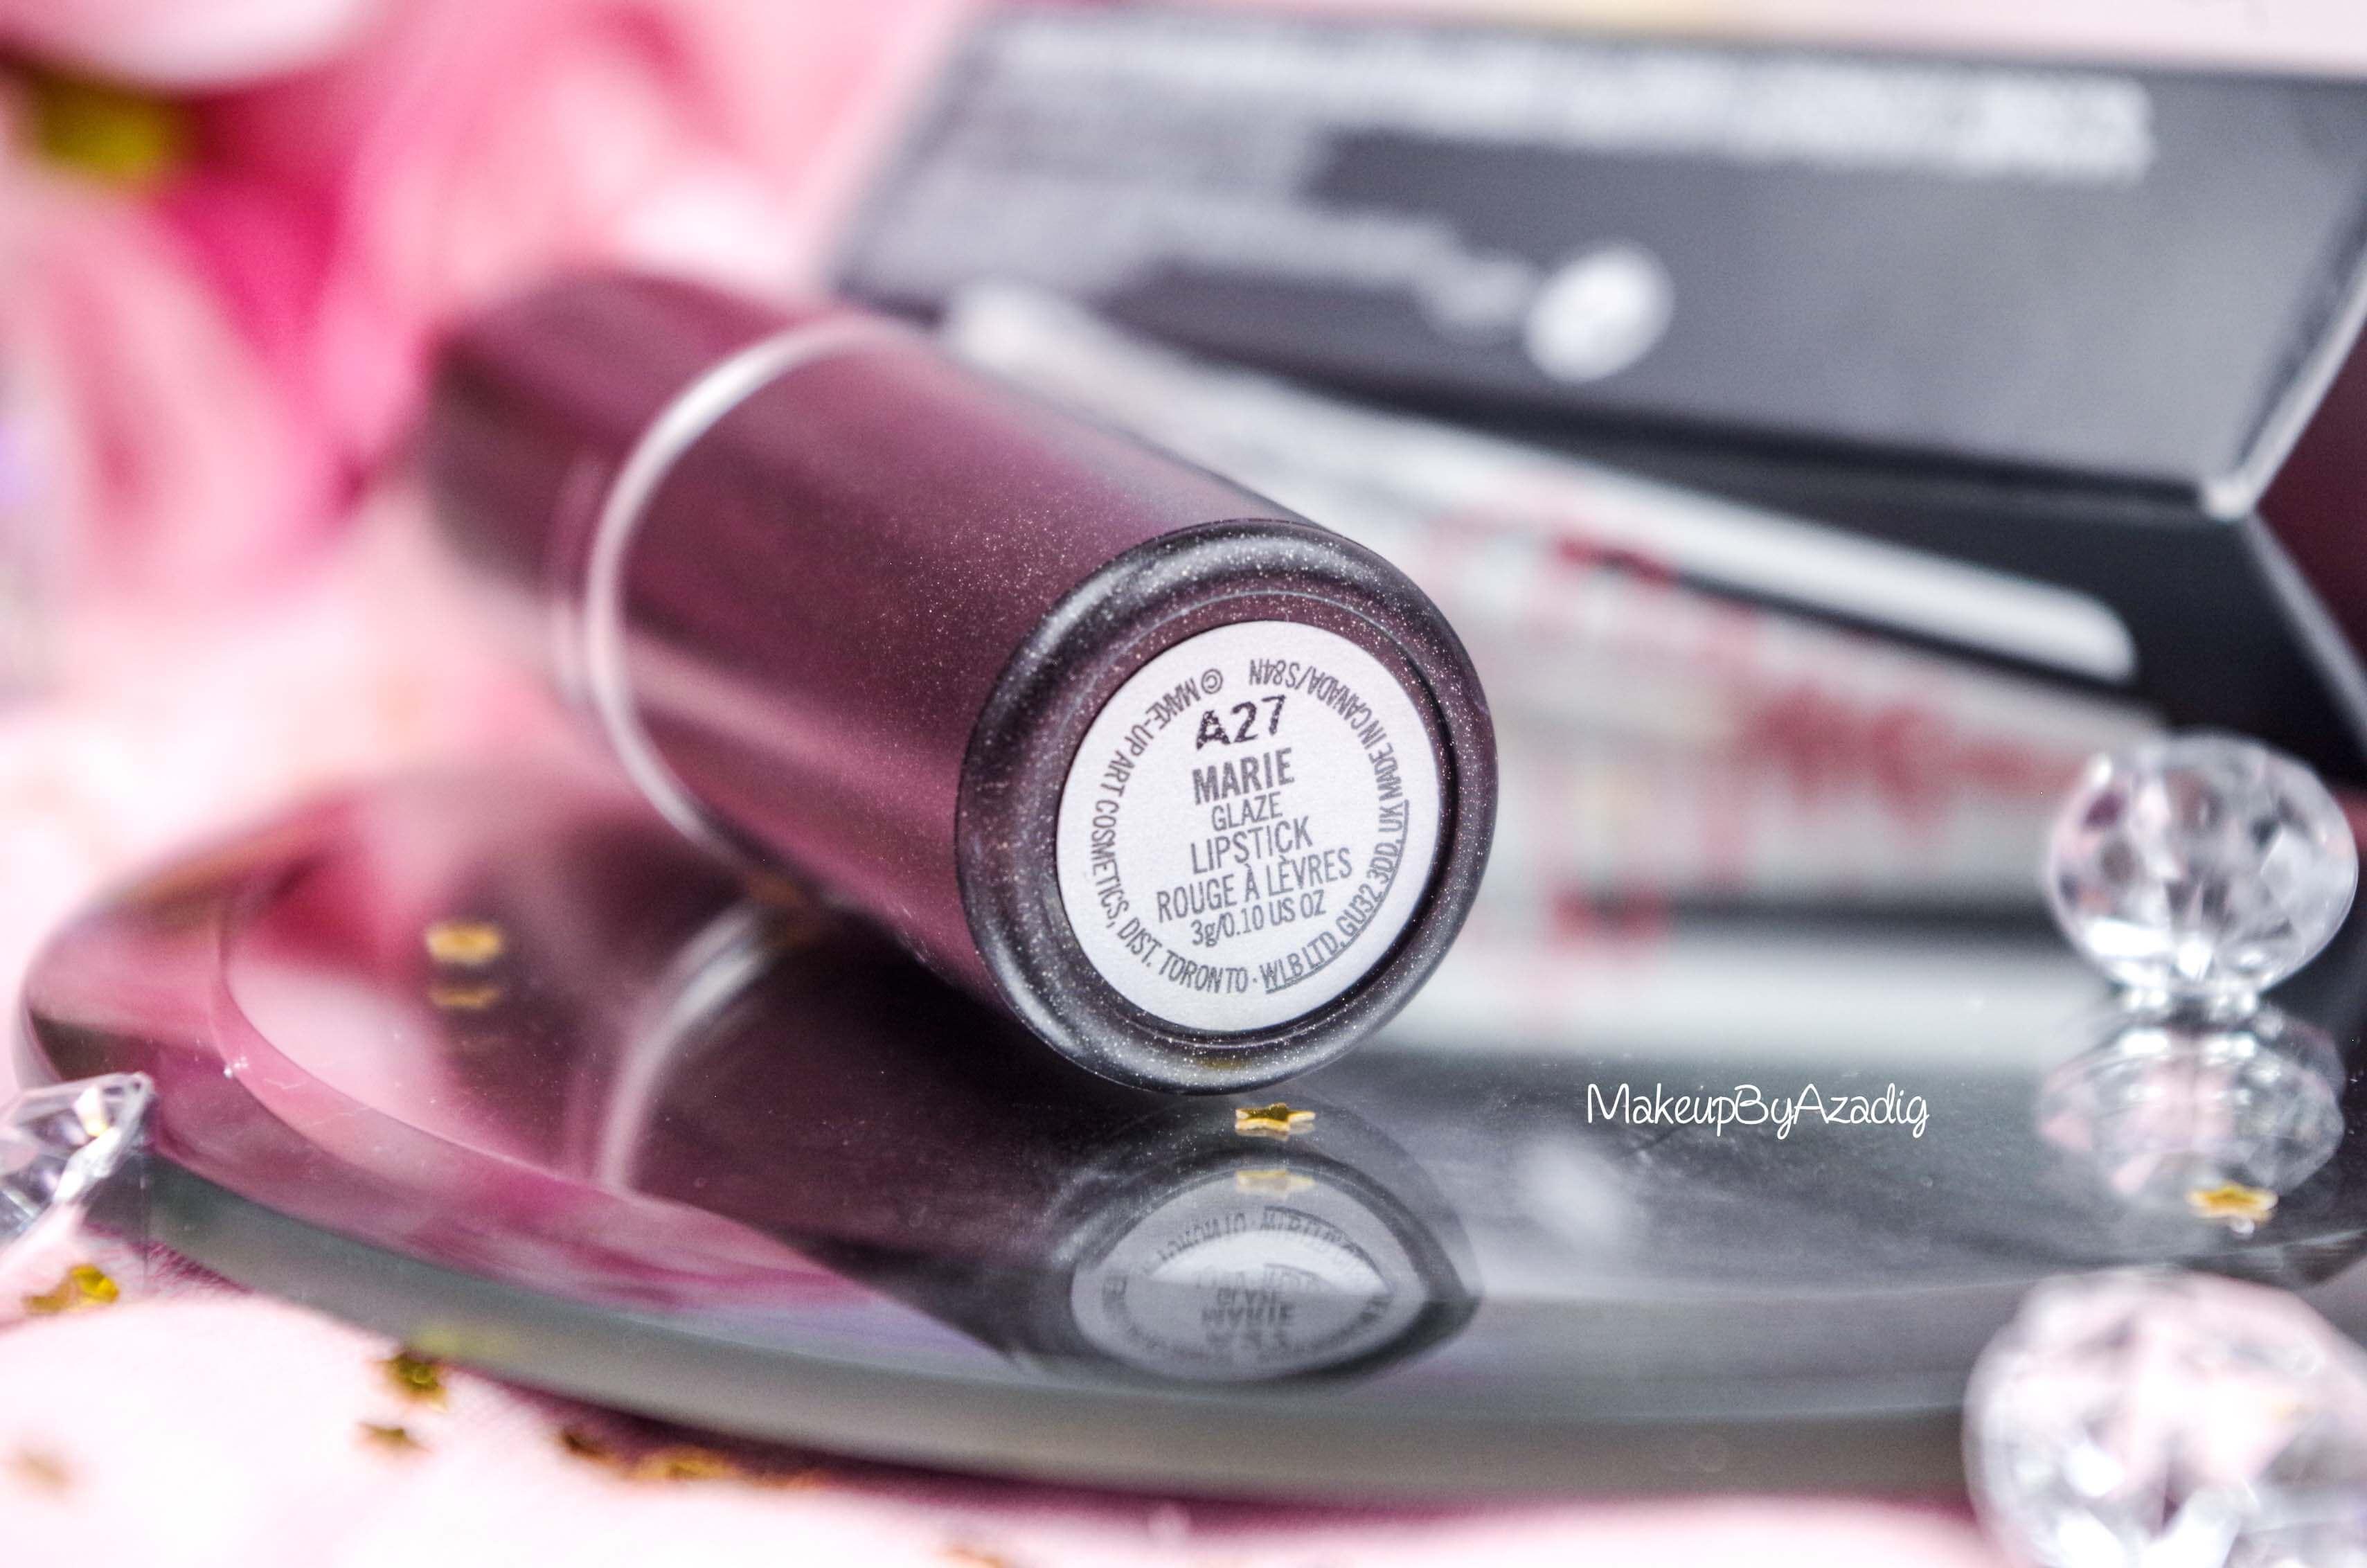 toronto-macxmarie-mac-cosmetics-rouge-a-levres-enjoy-phoenix-collaboration-makeupbyazadig-revue-avis-prix-meetup